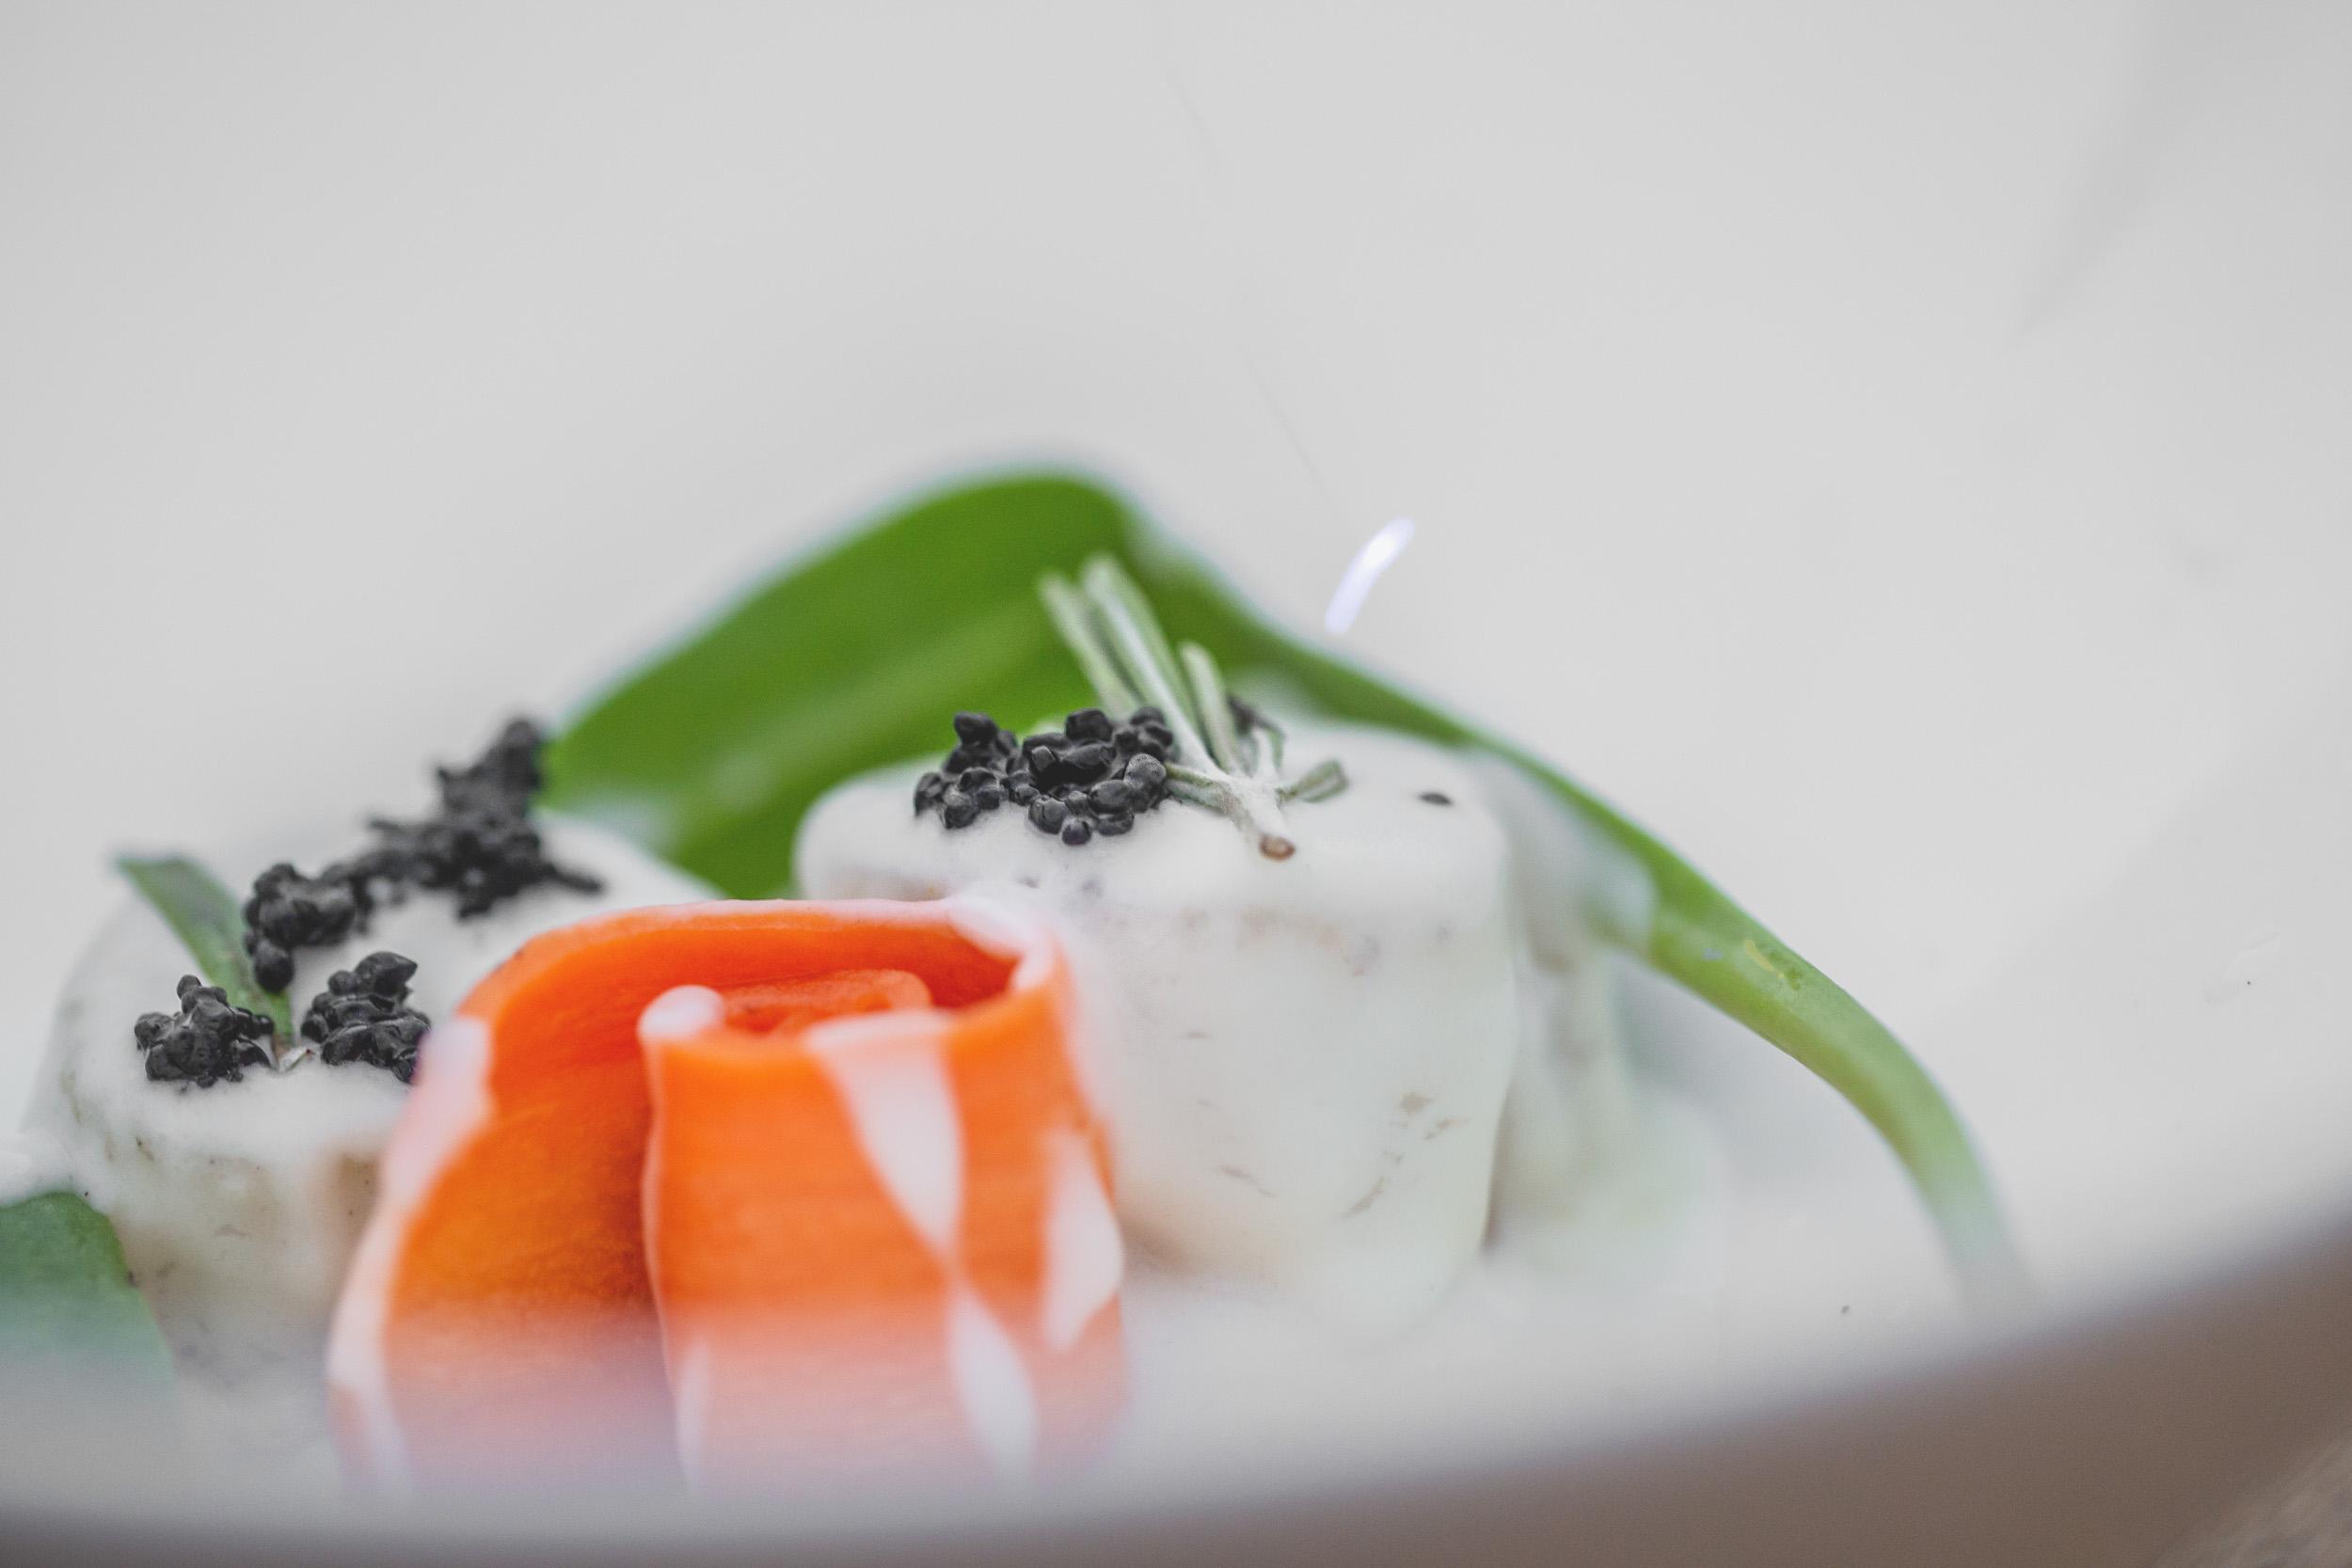 https://hofmans-events.nl/wp-content/uploads/2019/11/hofmans-catering-events-030.jpg